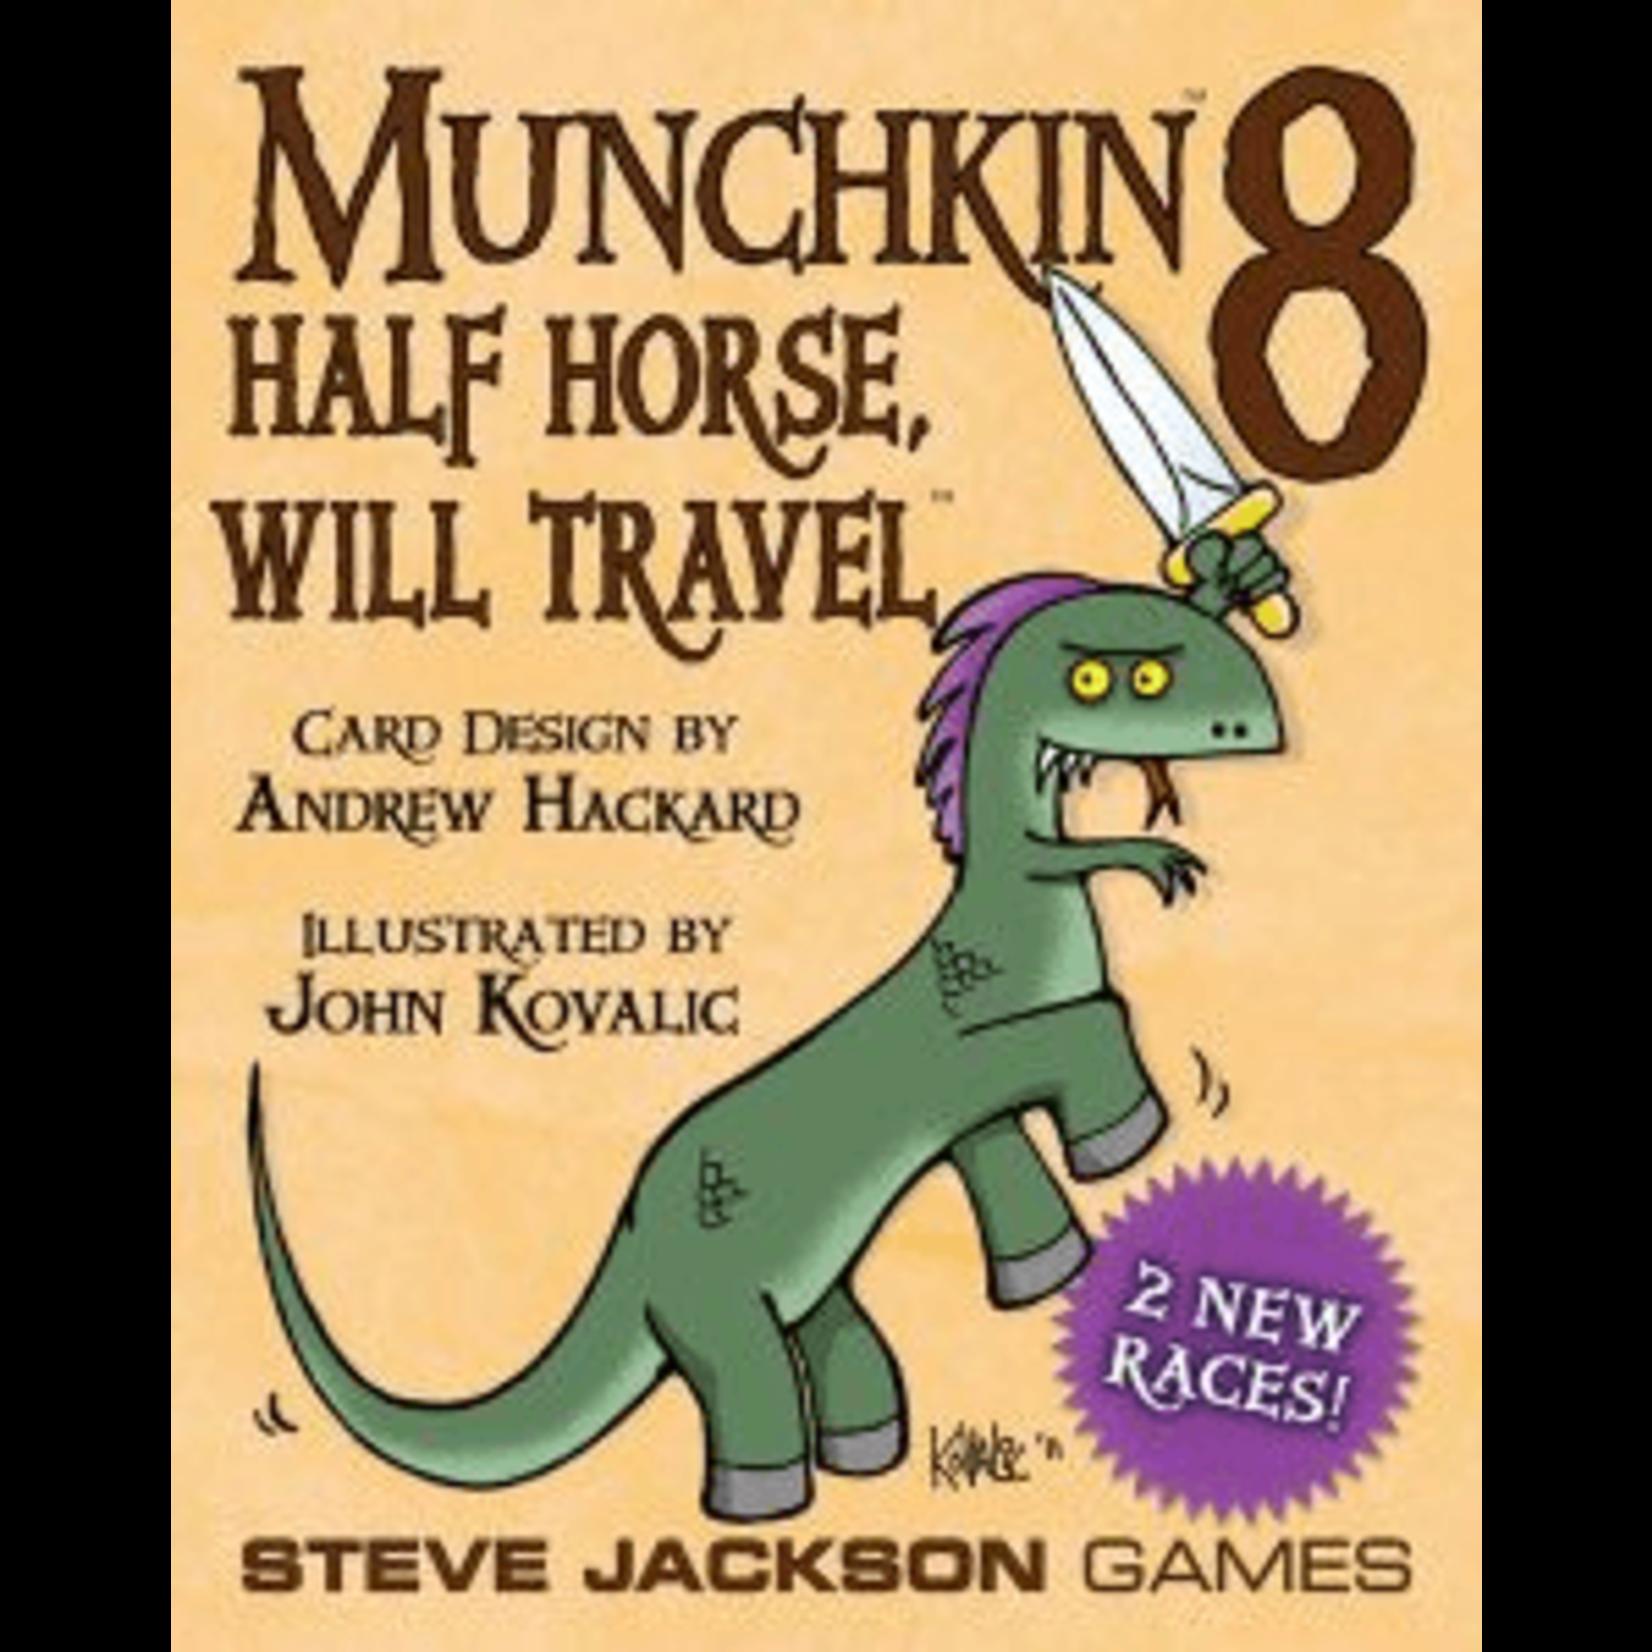 Steve Jackson Games Munchkin 8: Half Horse Will Travel